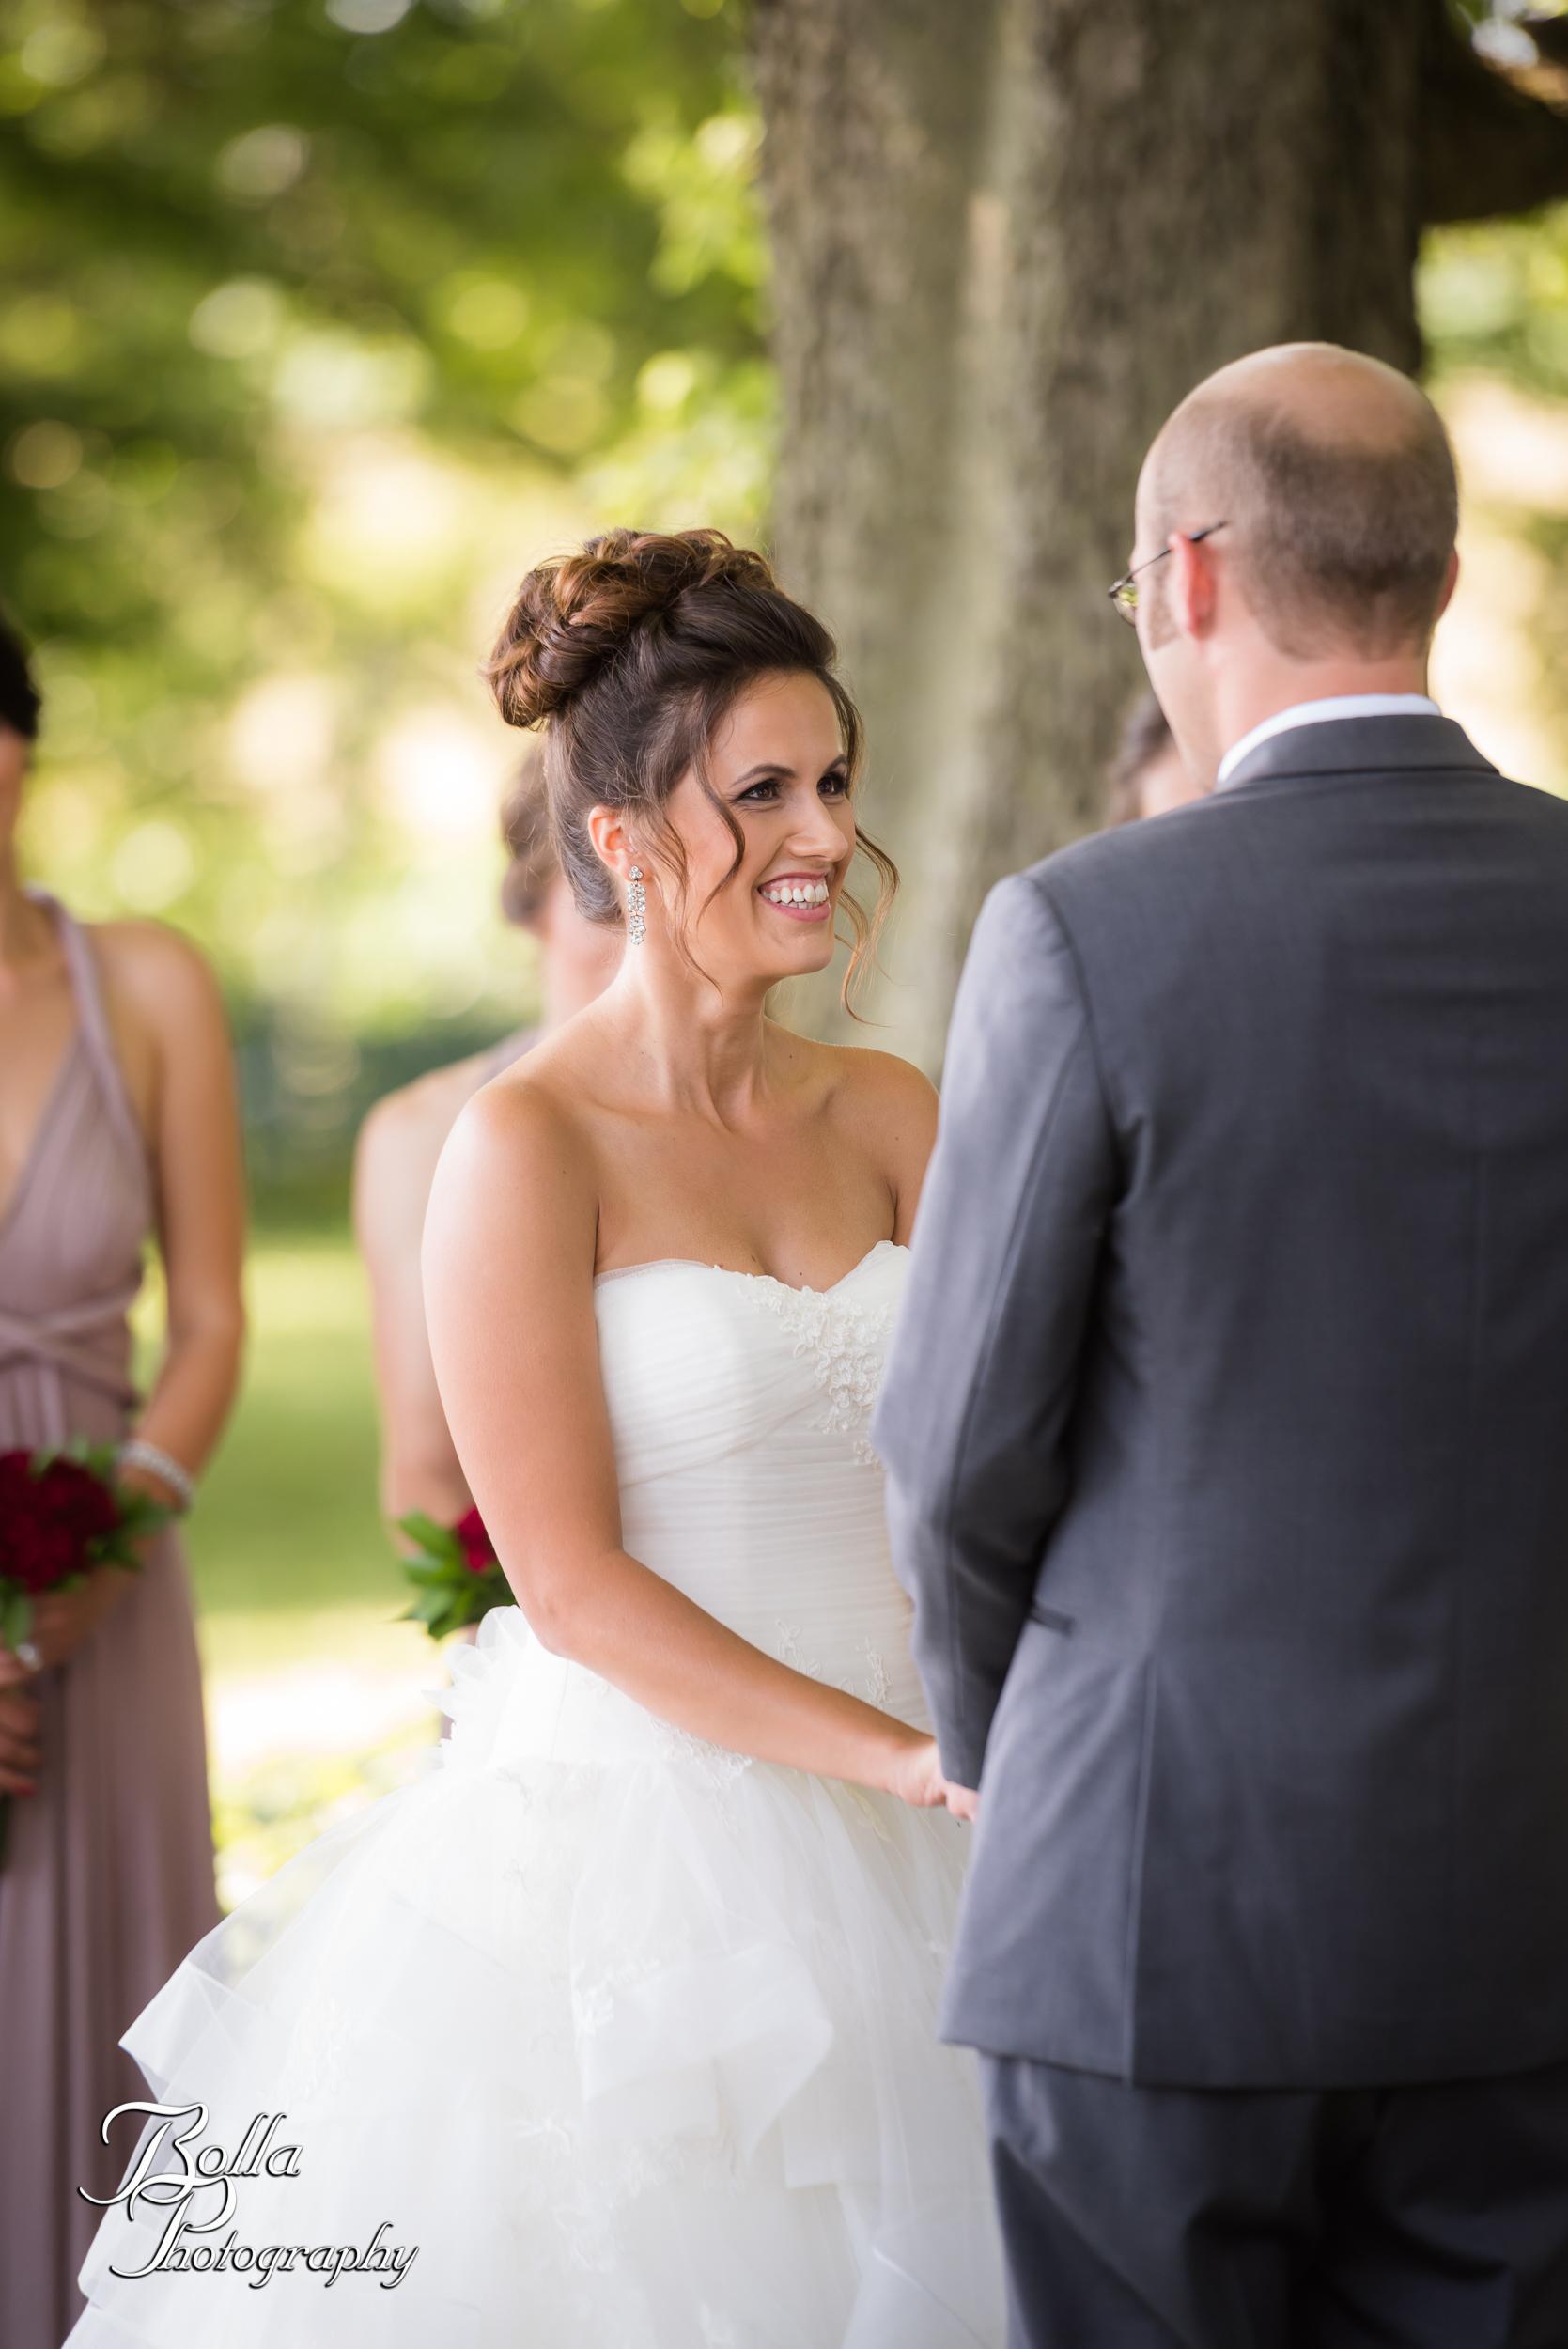 Bolla_photography_edwardsville_wedding_photographer_st_louis_weddings_Highland_outdoor_ceremony_Louis_Latzer_Homestead_Theims-0218.jpg